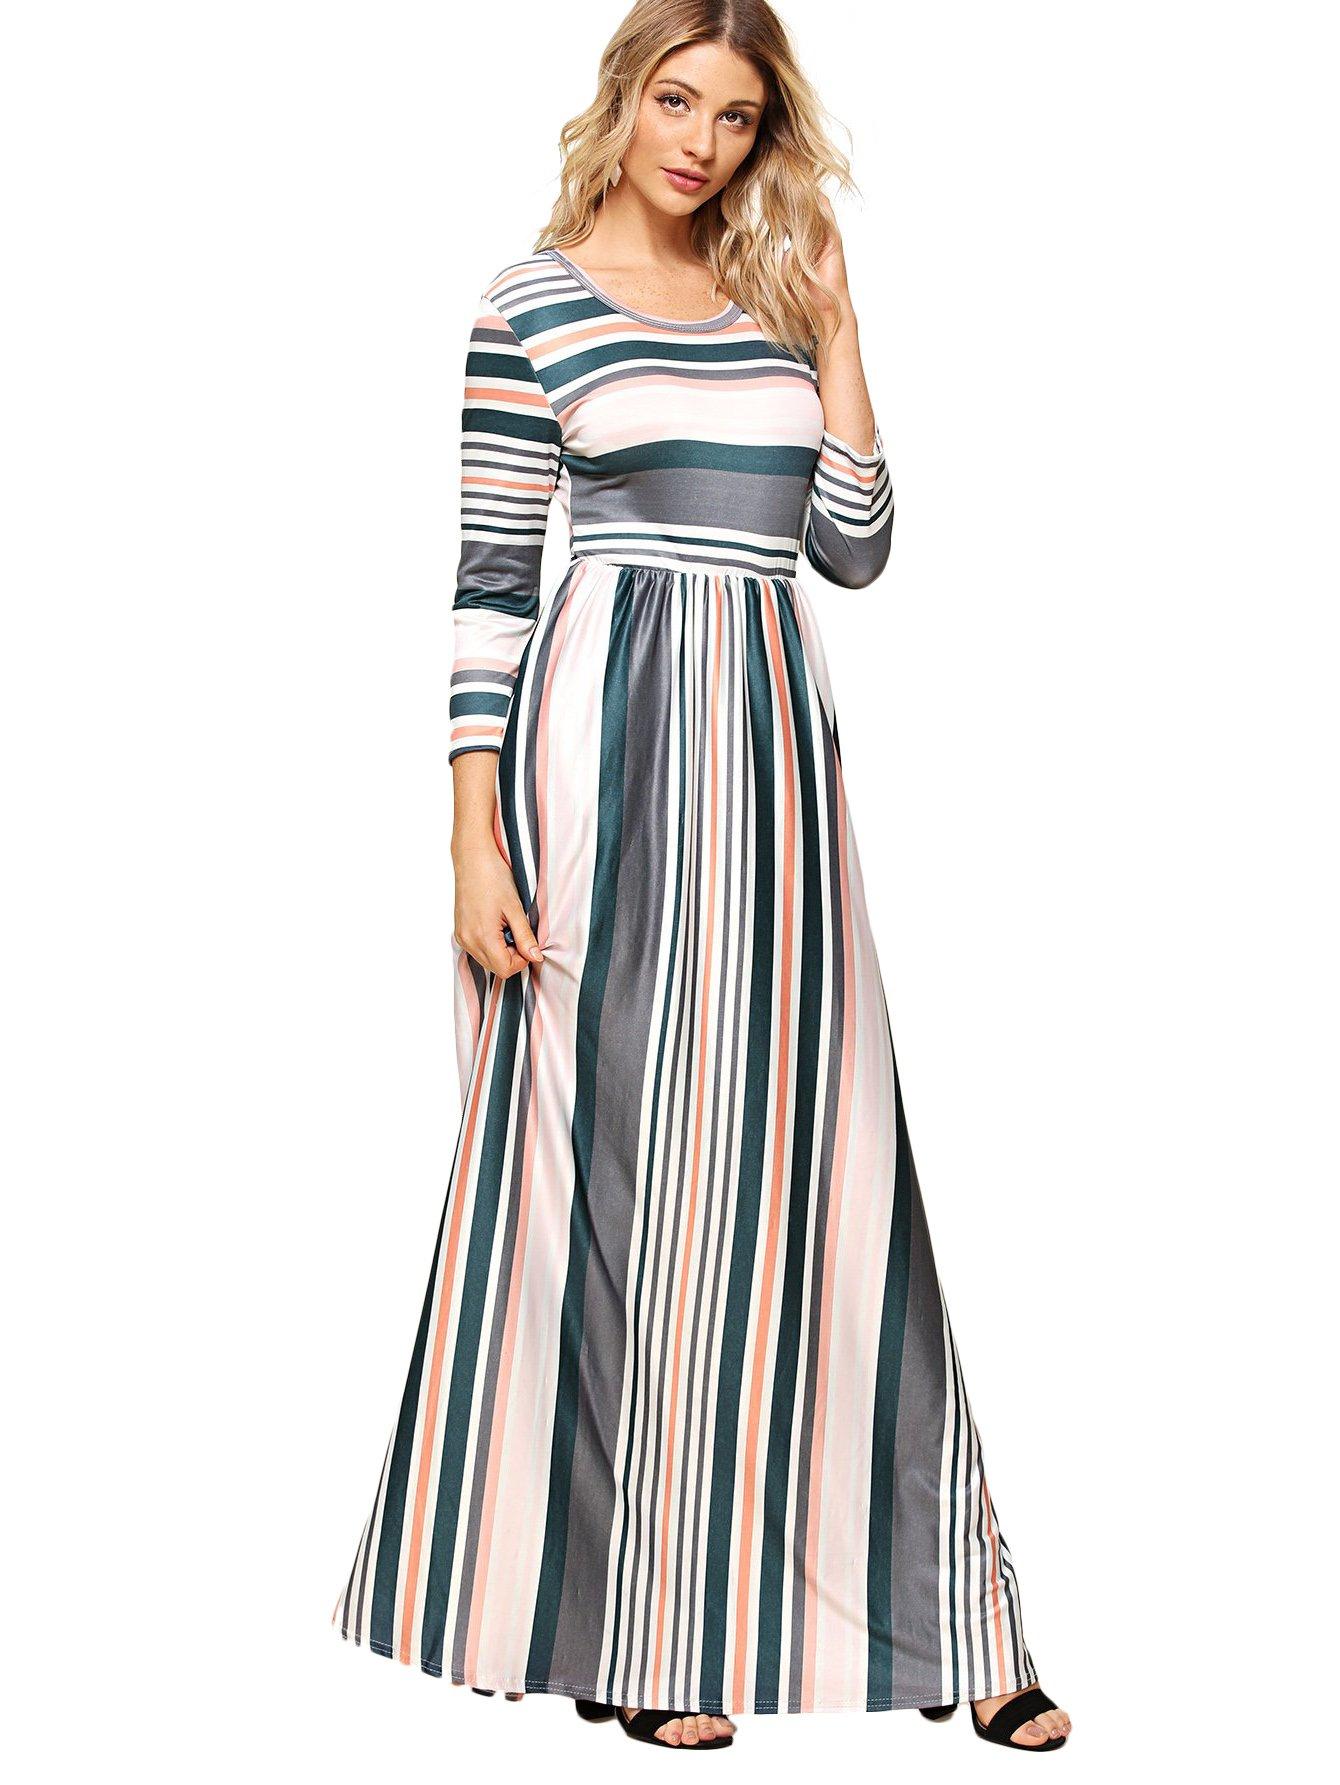 Milumia Women's Long Sleeve Striped High Waist Maxi Dress Large Multicolor-1